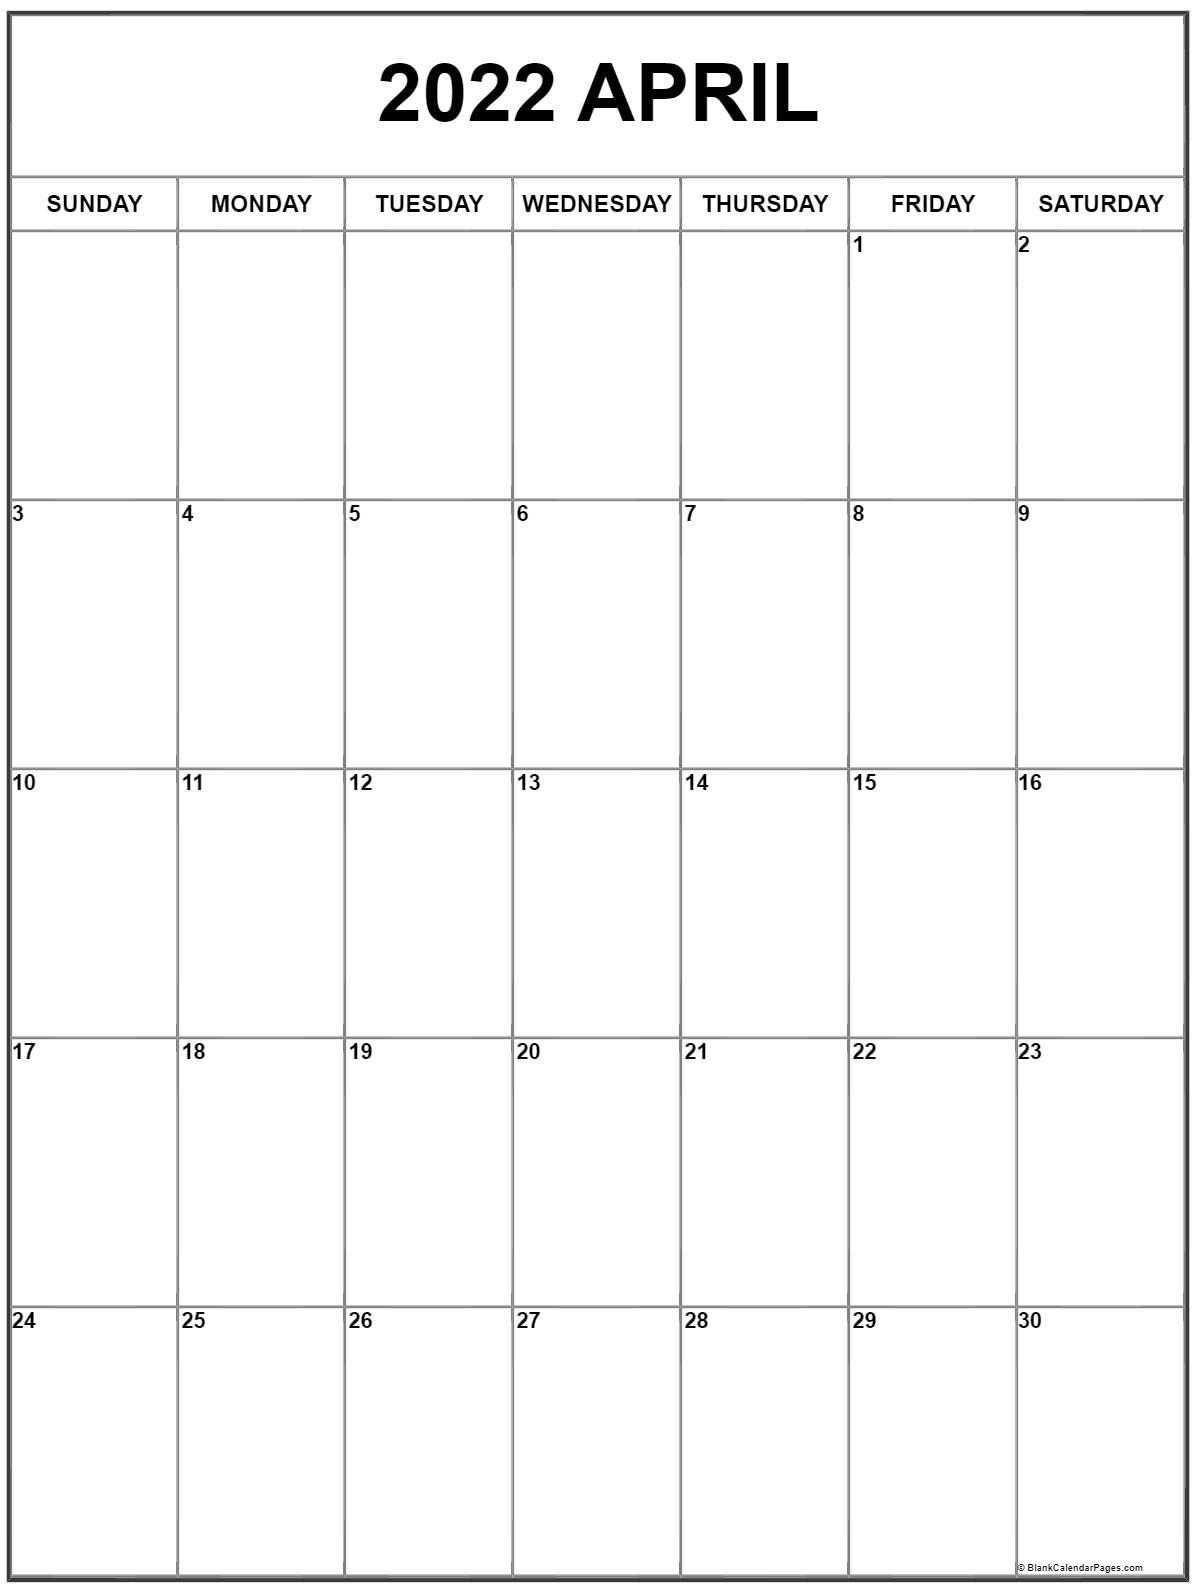 April 2022 Vertical Calendar | Portrait within Printable April 2022 Calendar